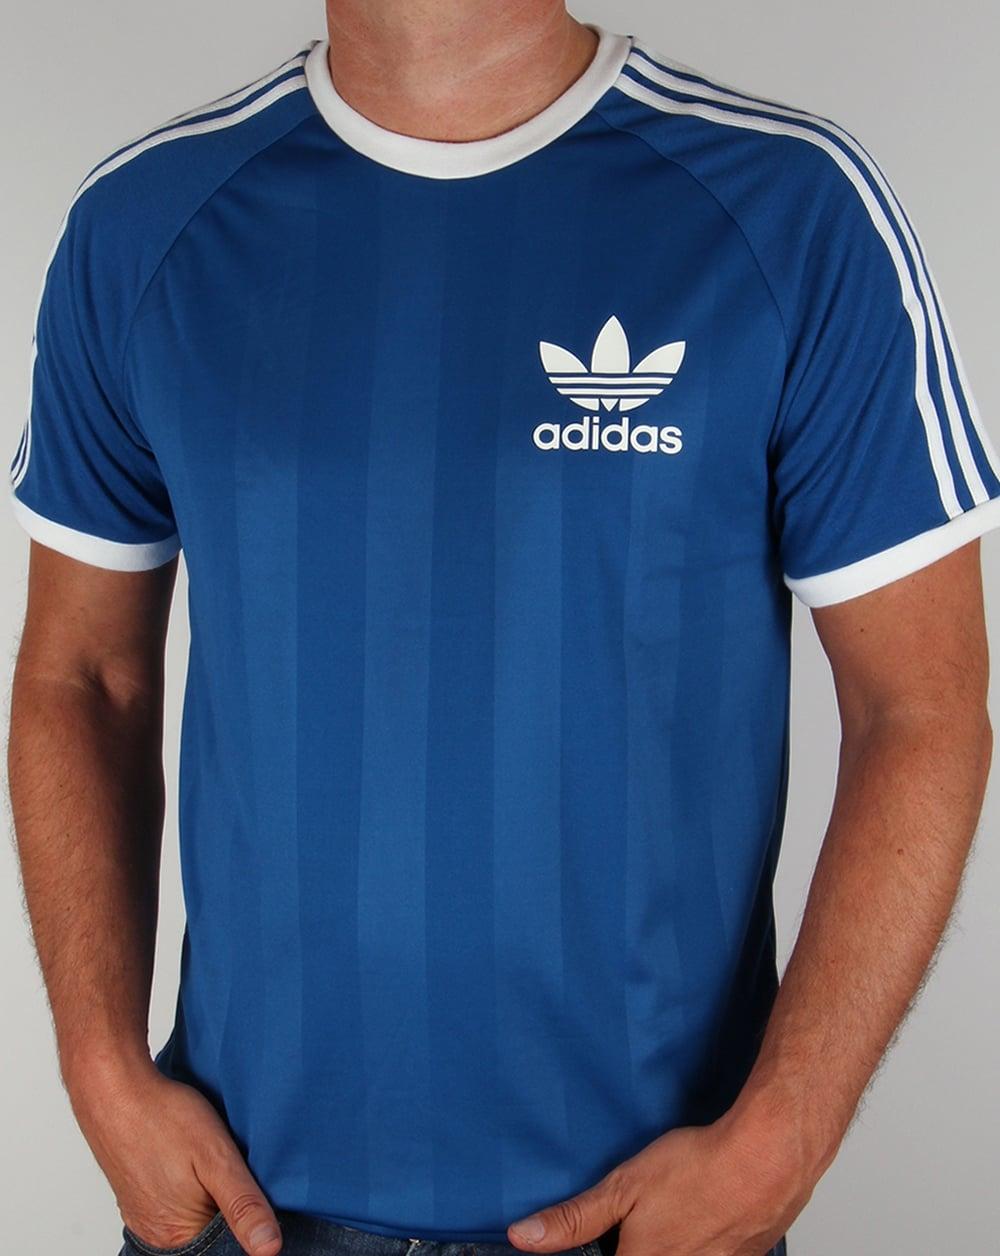 adidas trainers womens uk shirts